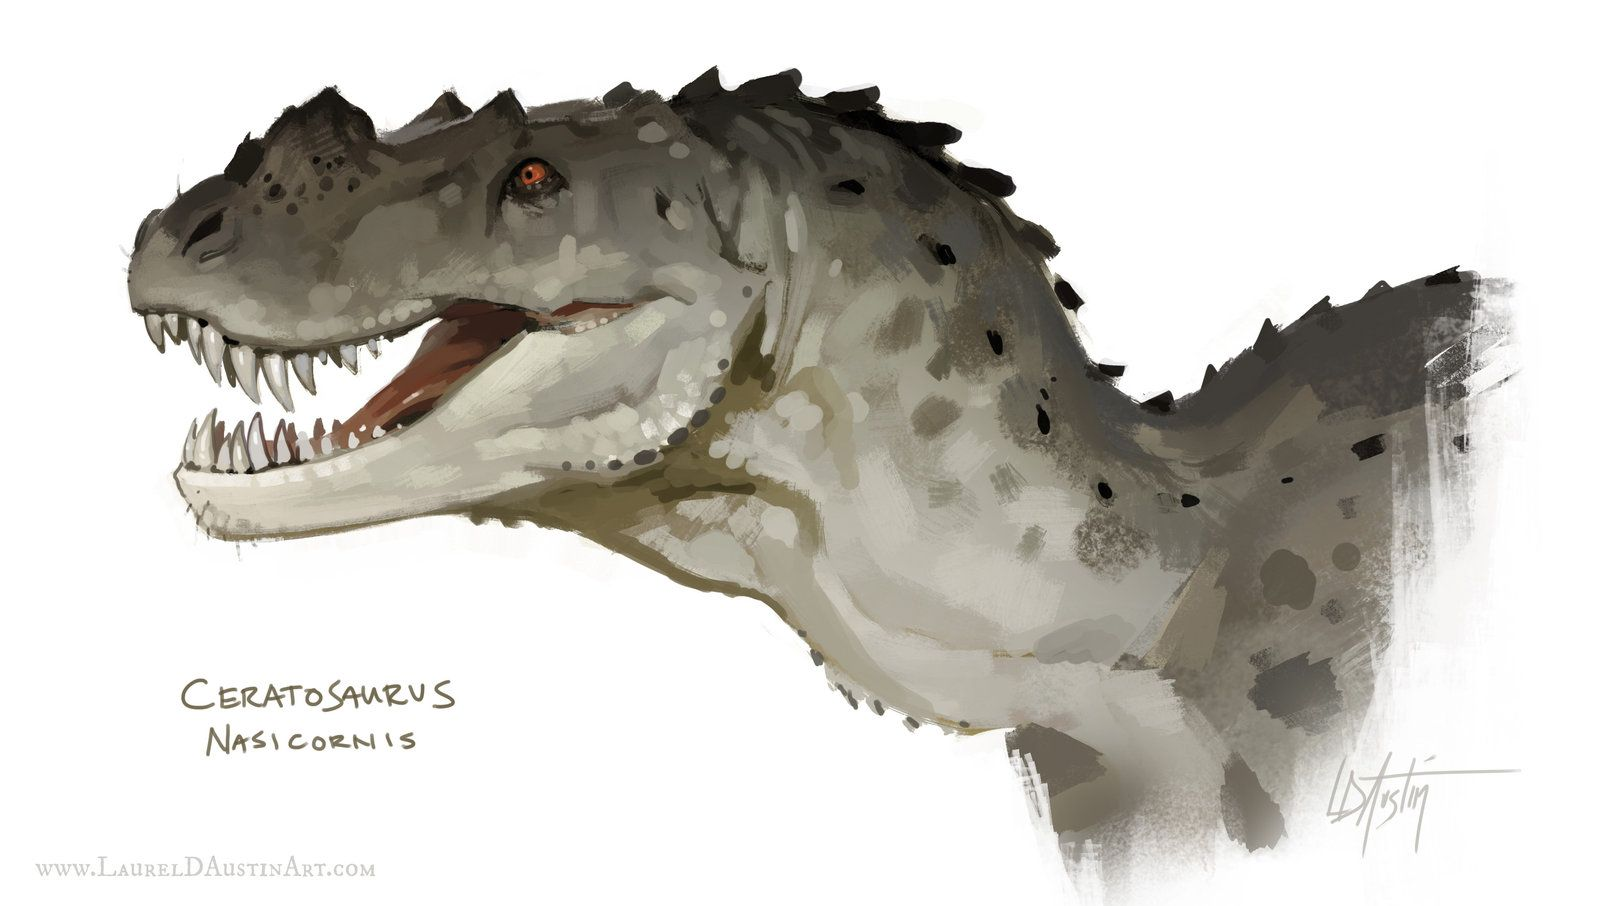 Ceratosaurus with Process Video, Laurel D Austin on ArtStation at http://www.artstation.com/artwork/ceratosaurus-with-process-video